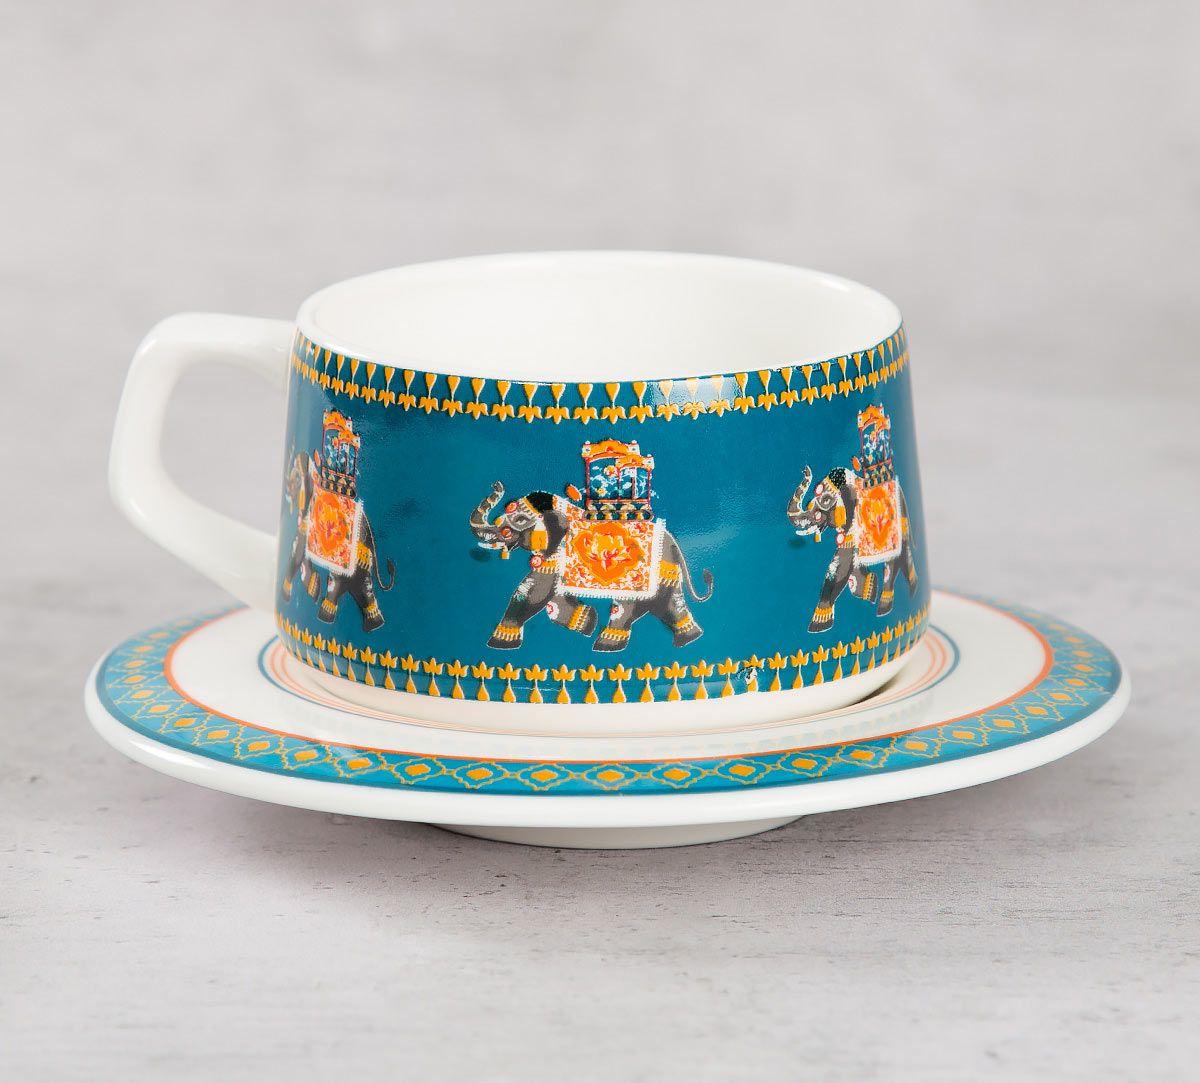 India Circus Swirling Safari Cup and Saucer (Set of 6)